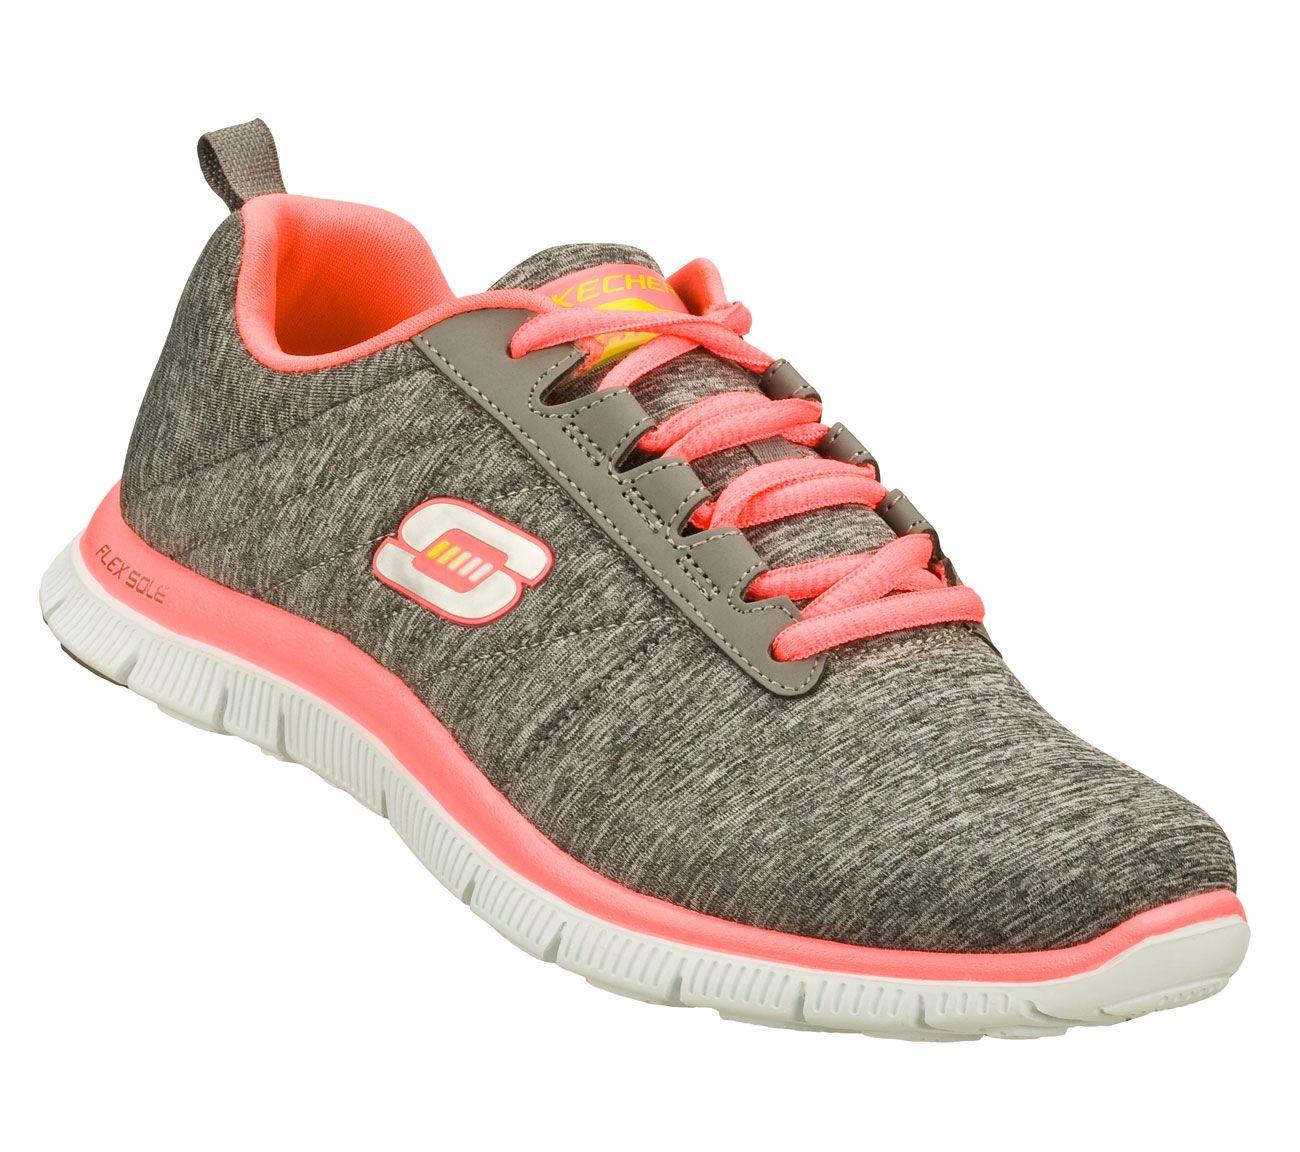 Sketchers Sneaker Boots Womens Running Shoes Skechers Women